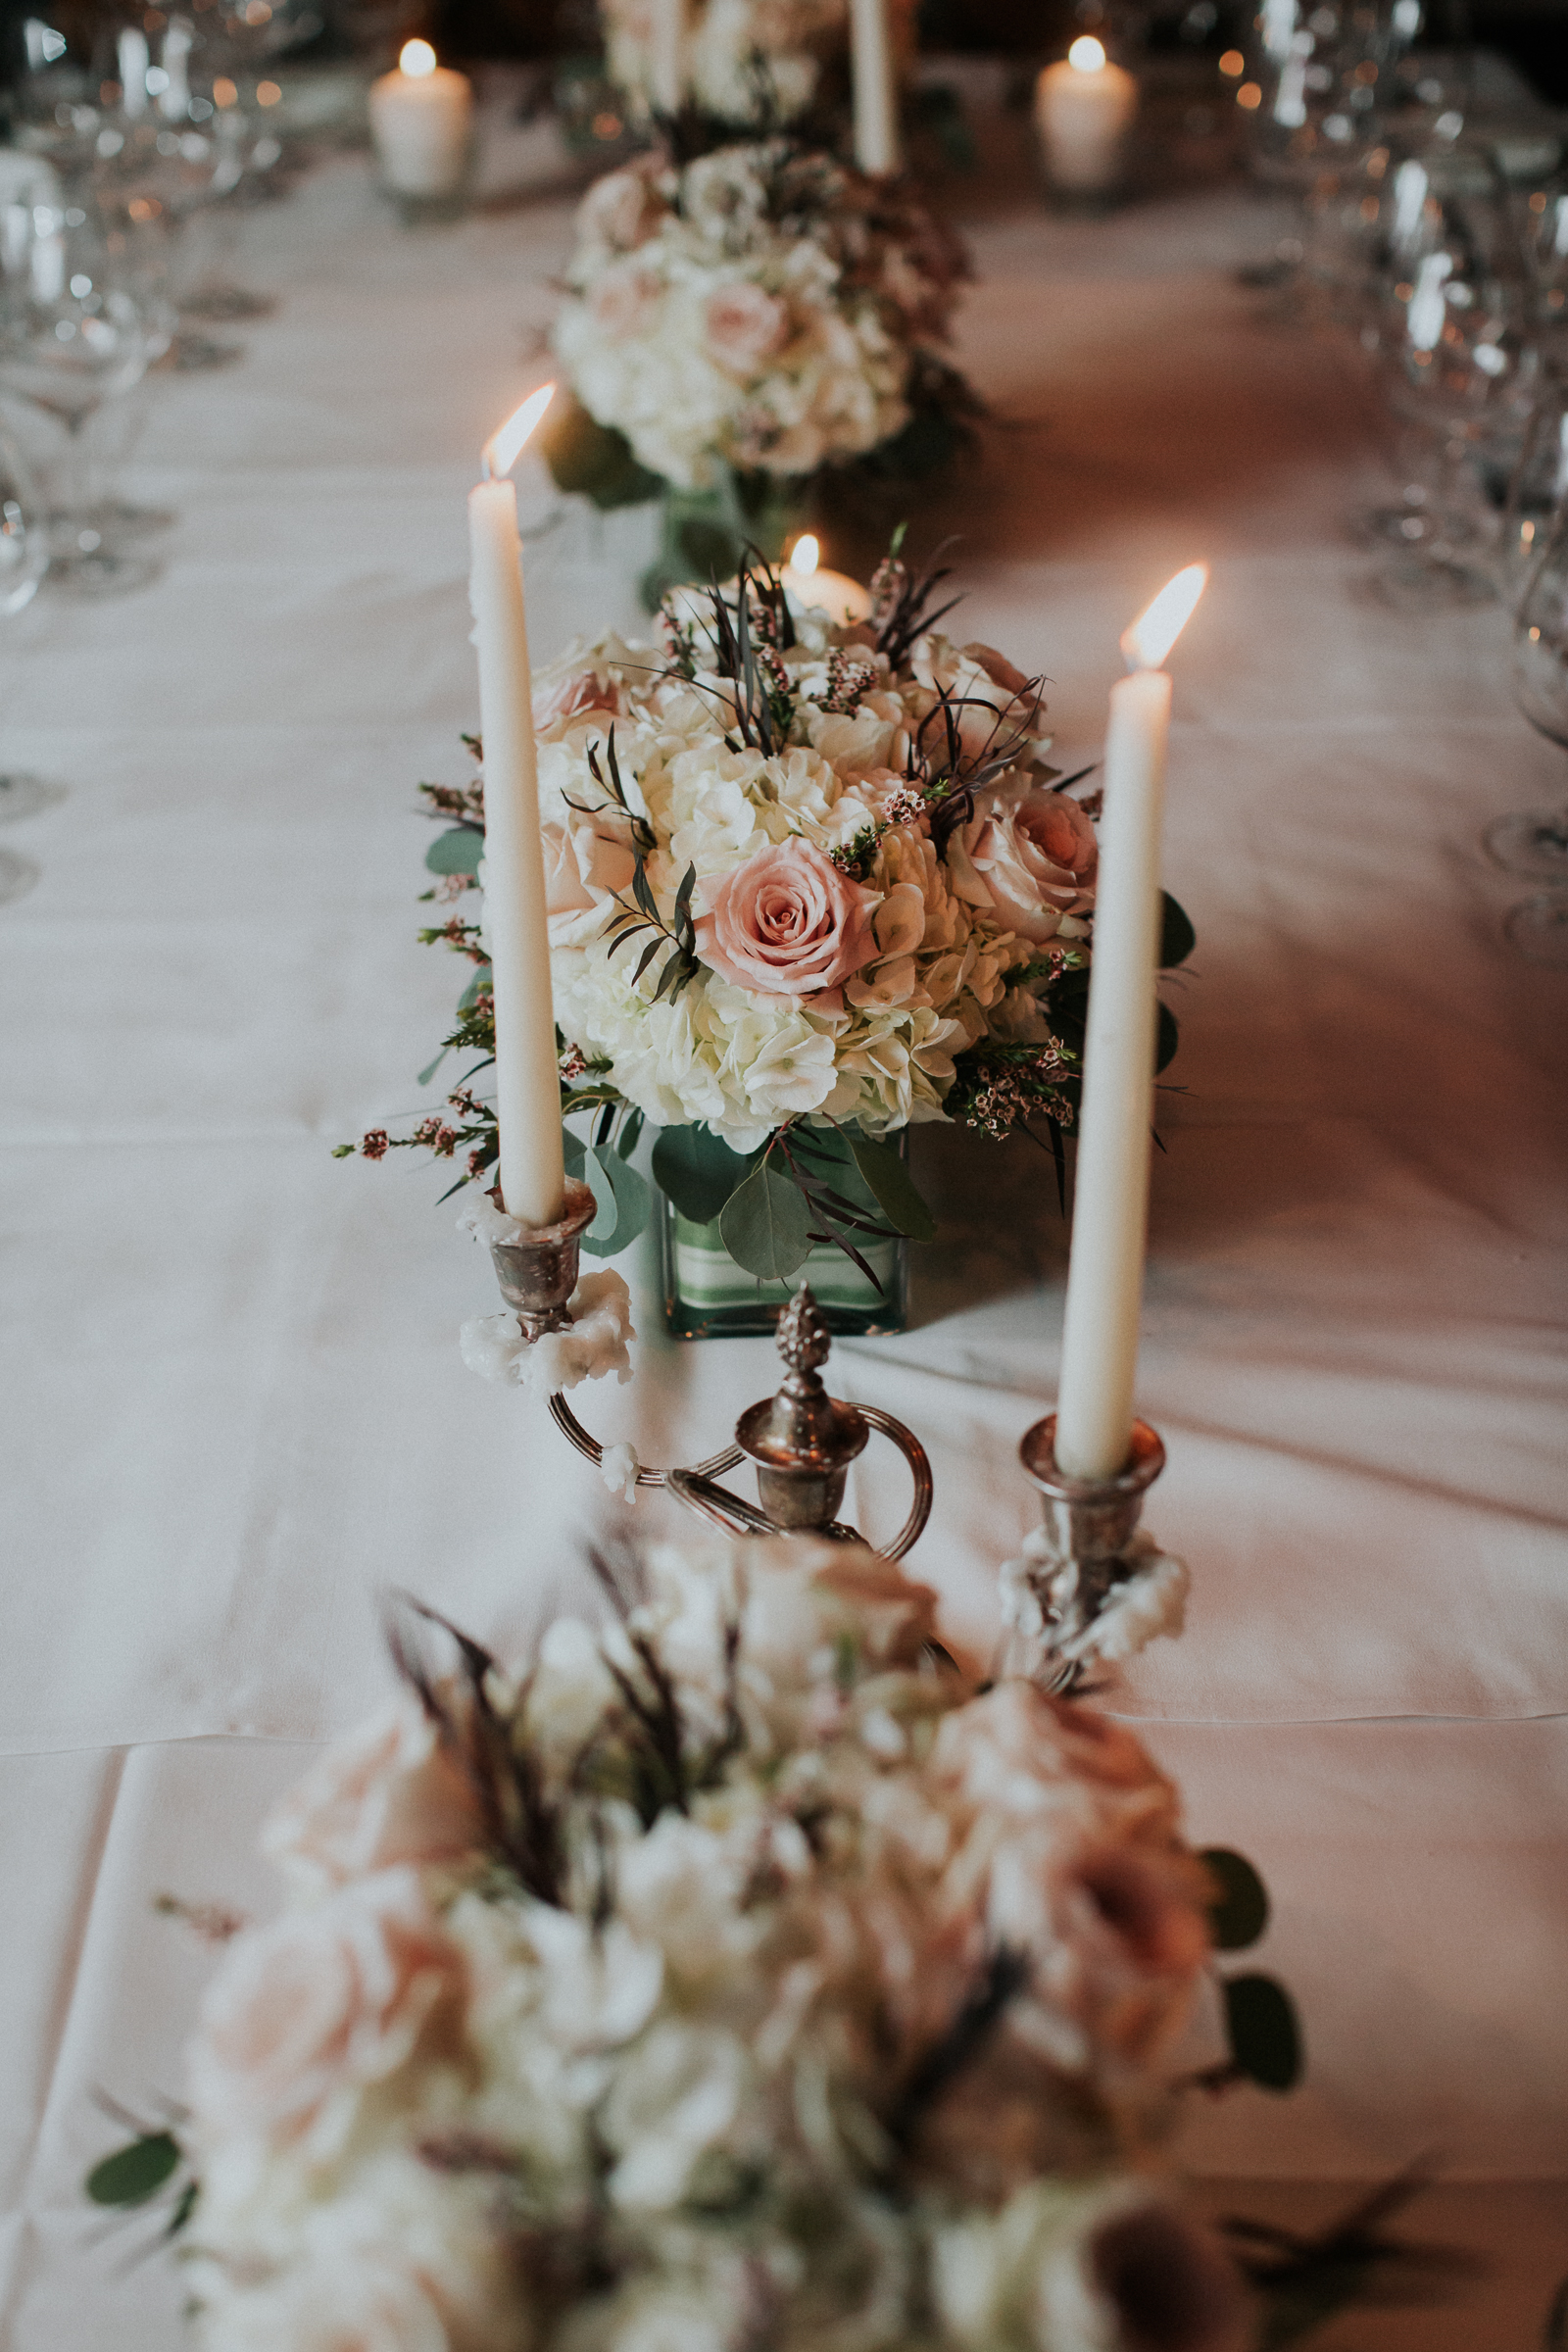 Casa-Apicii-Intimate-Wedding-City-Hall-Elopement-New-York-Documentary-Wedding-Photographer-49.jpg